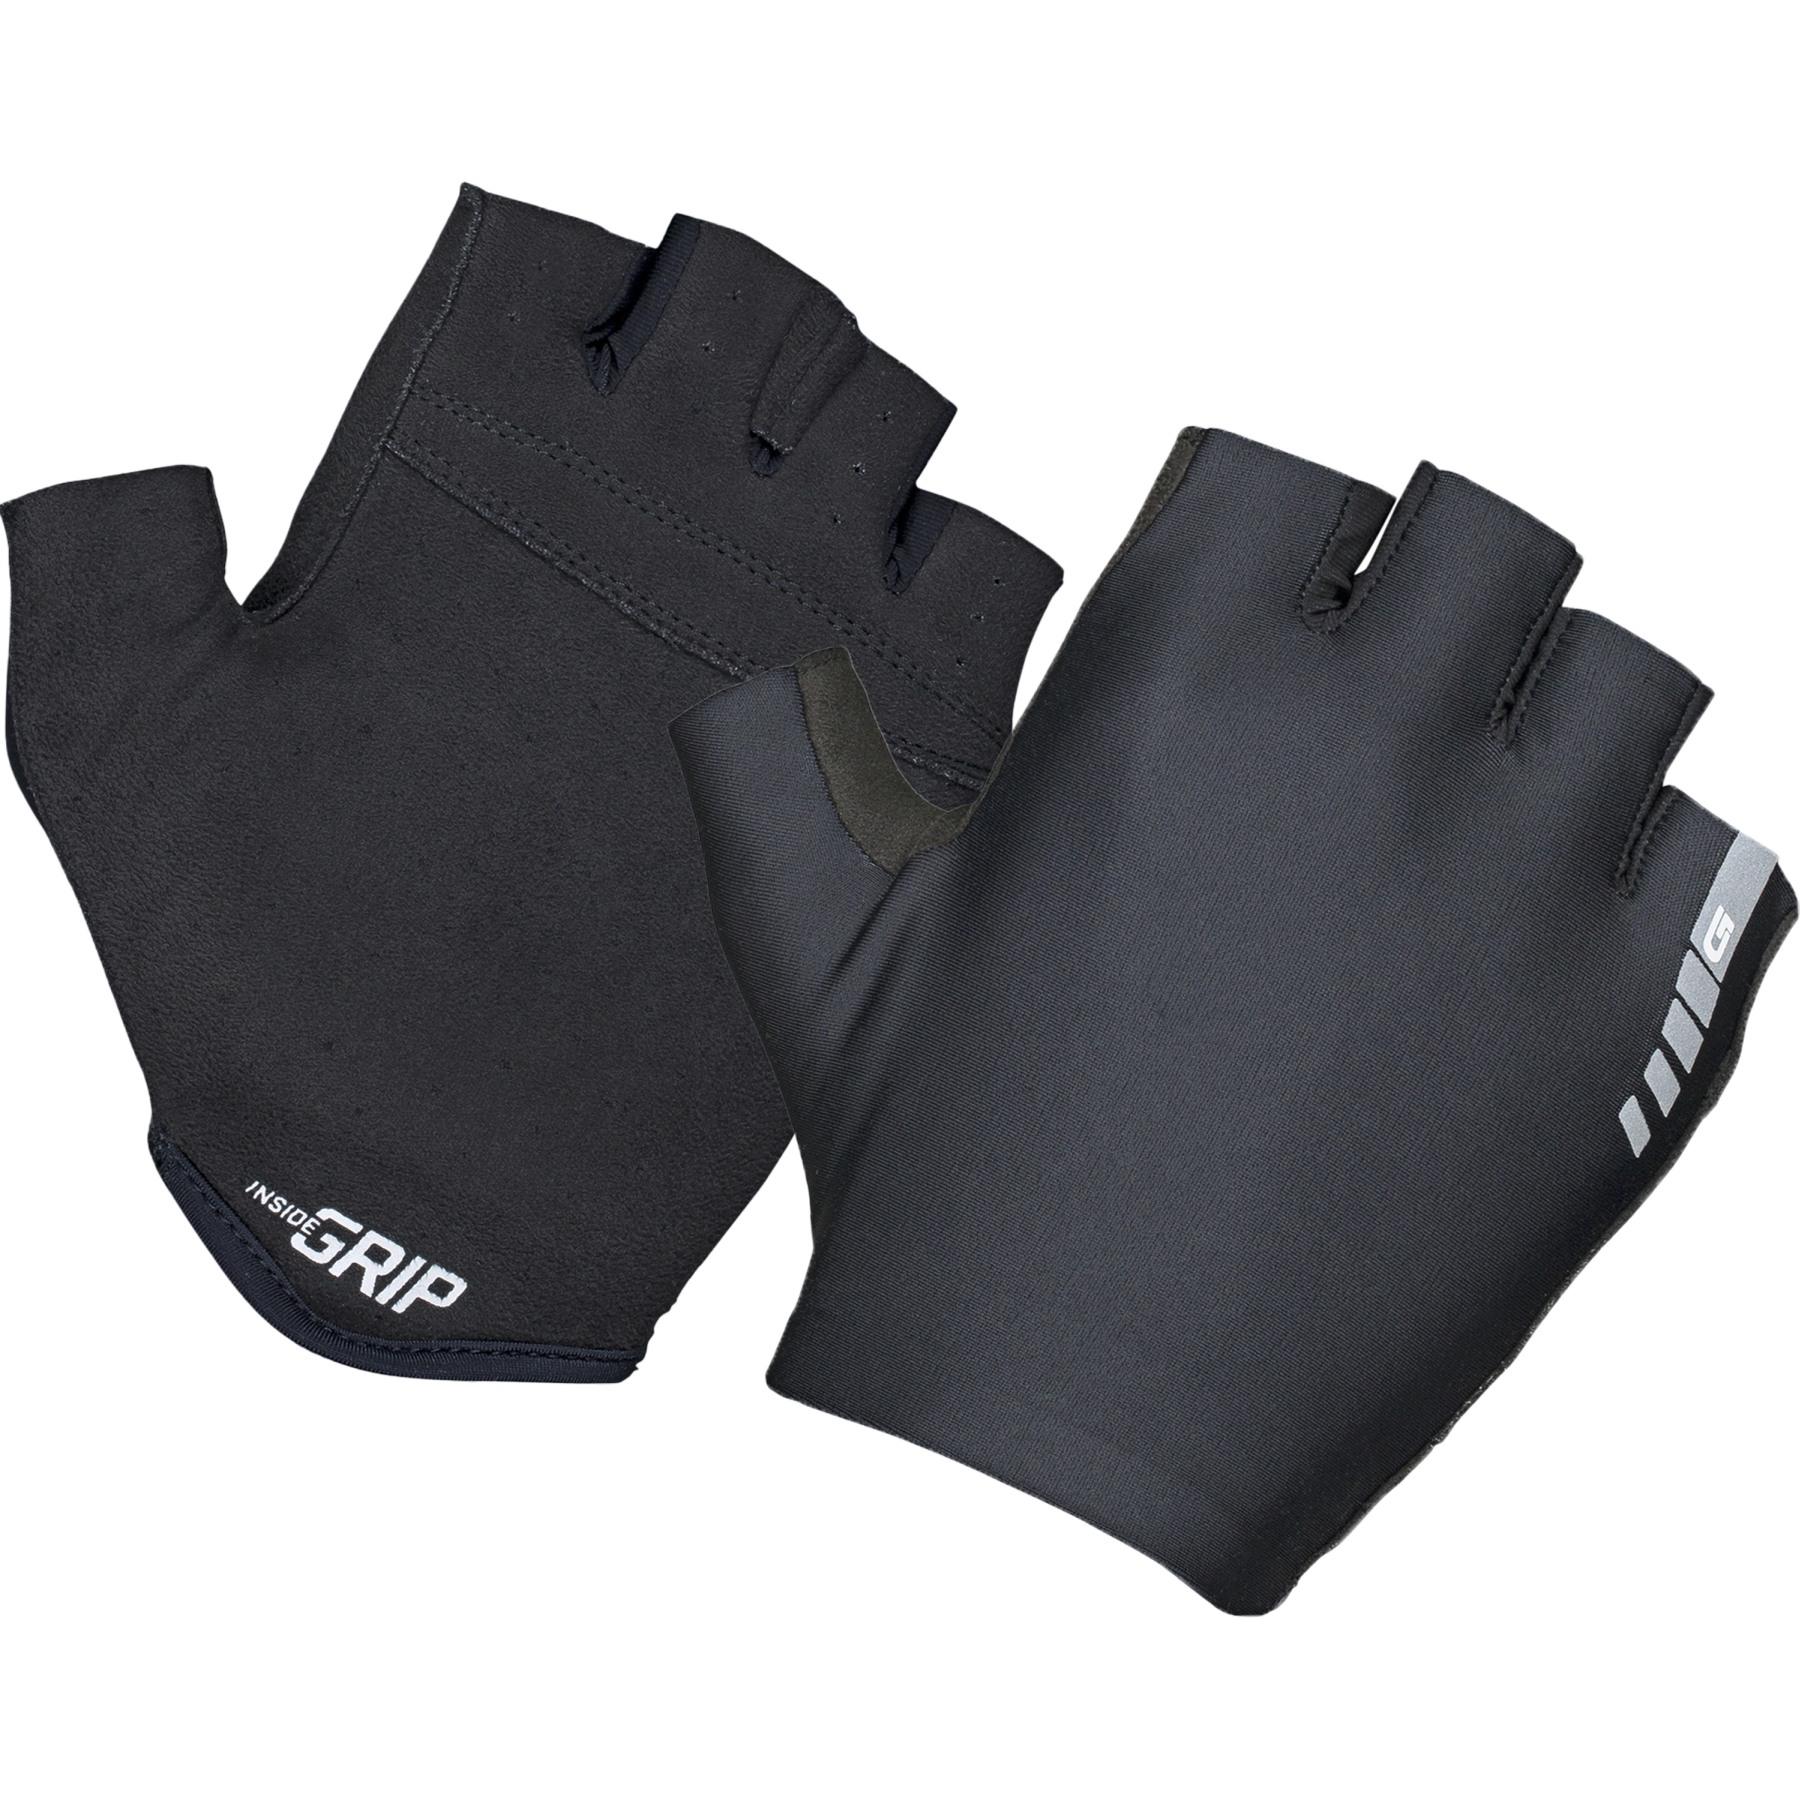 GripGrab Aerolite InsideGrip™ Short Finger Glove - Black